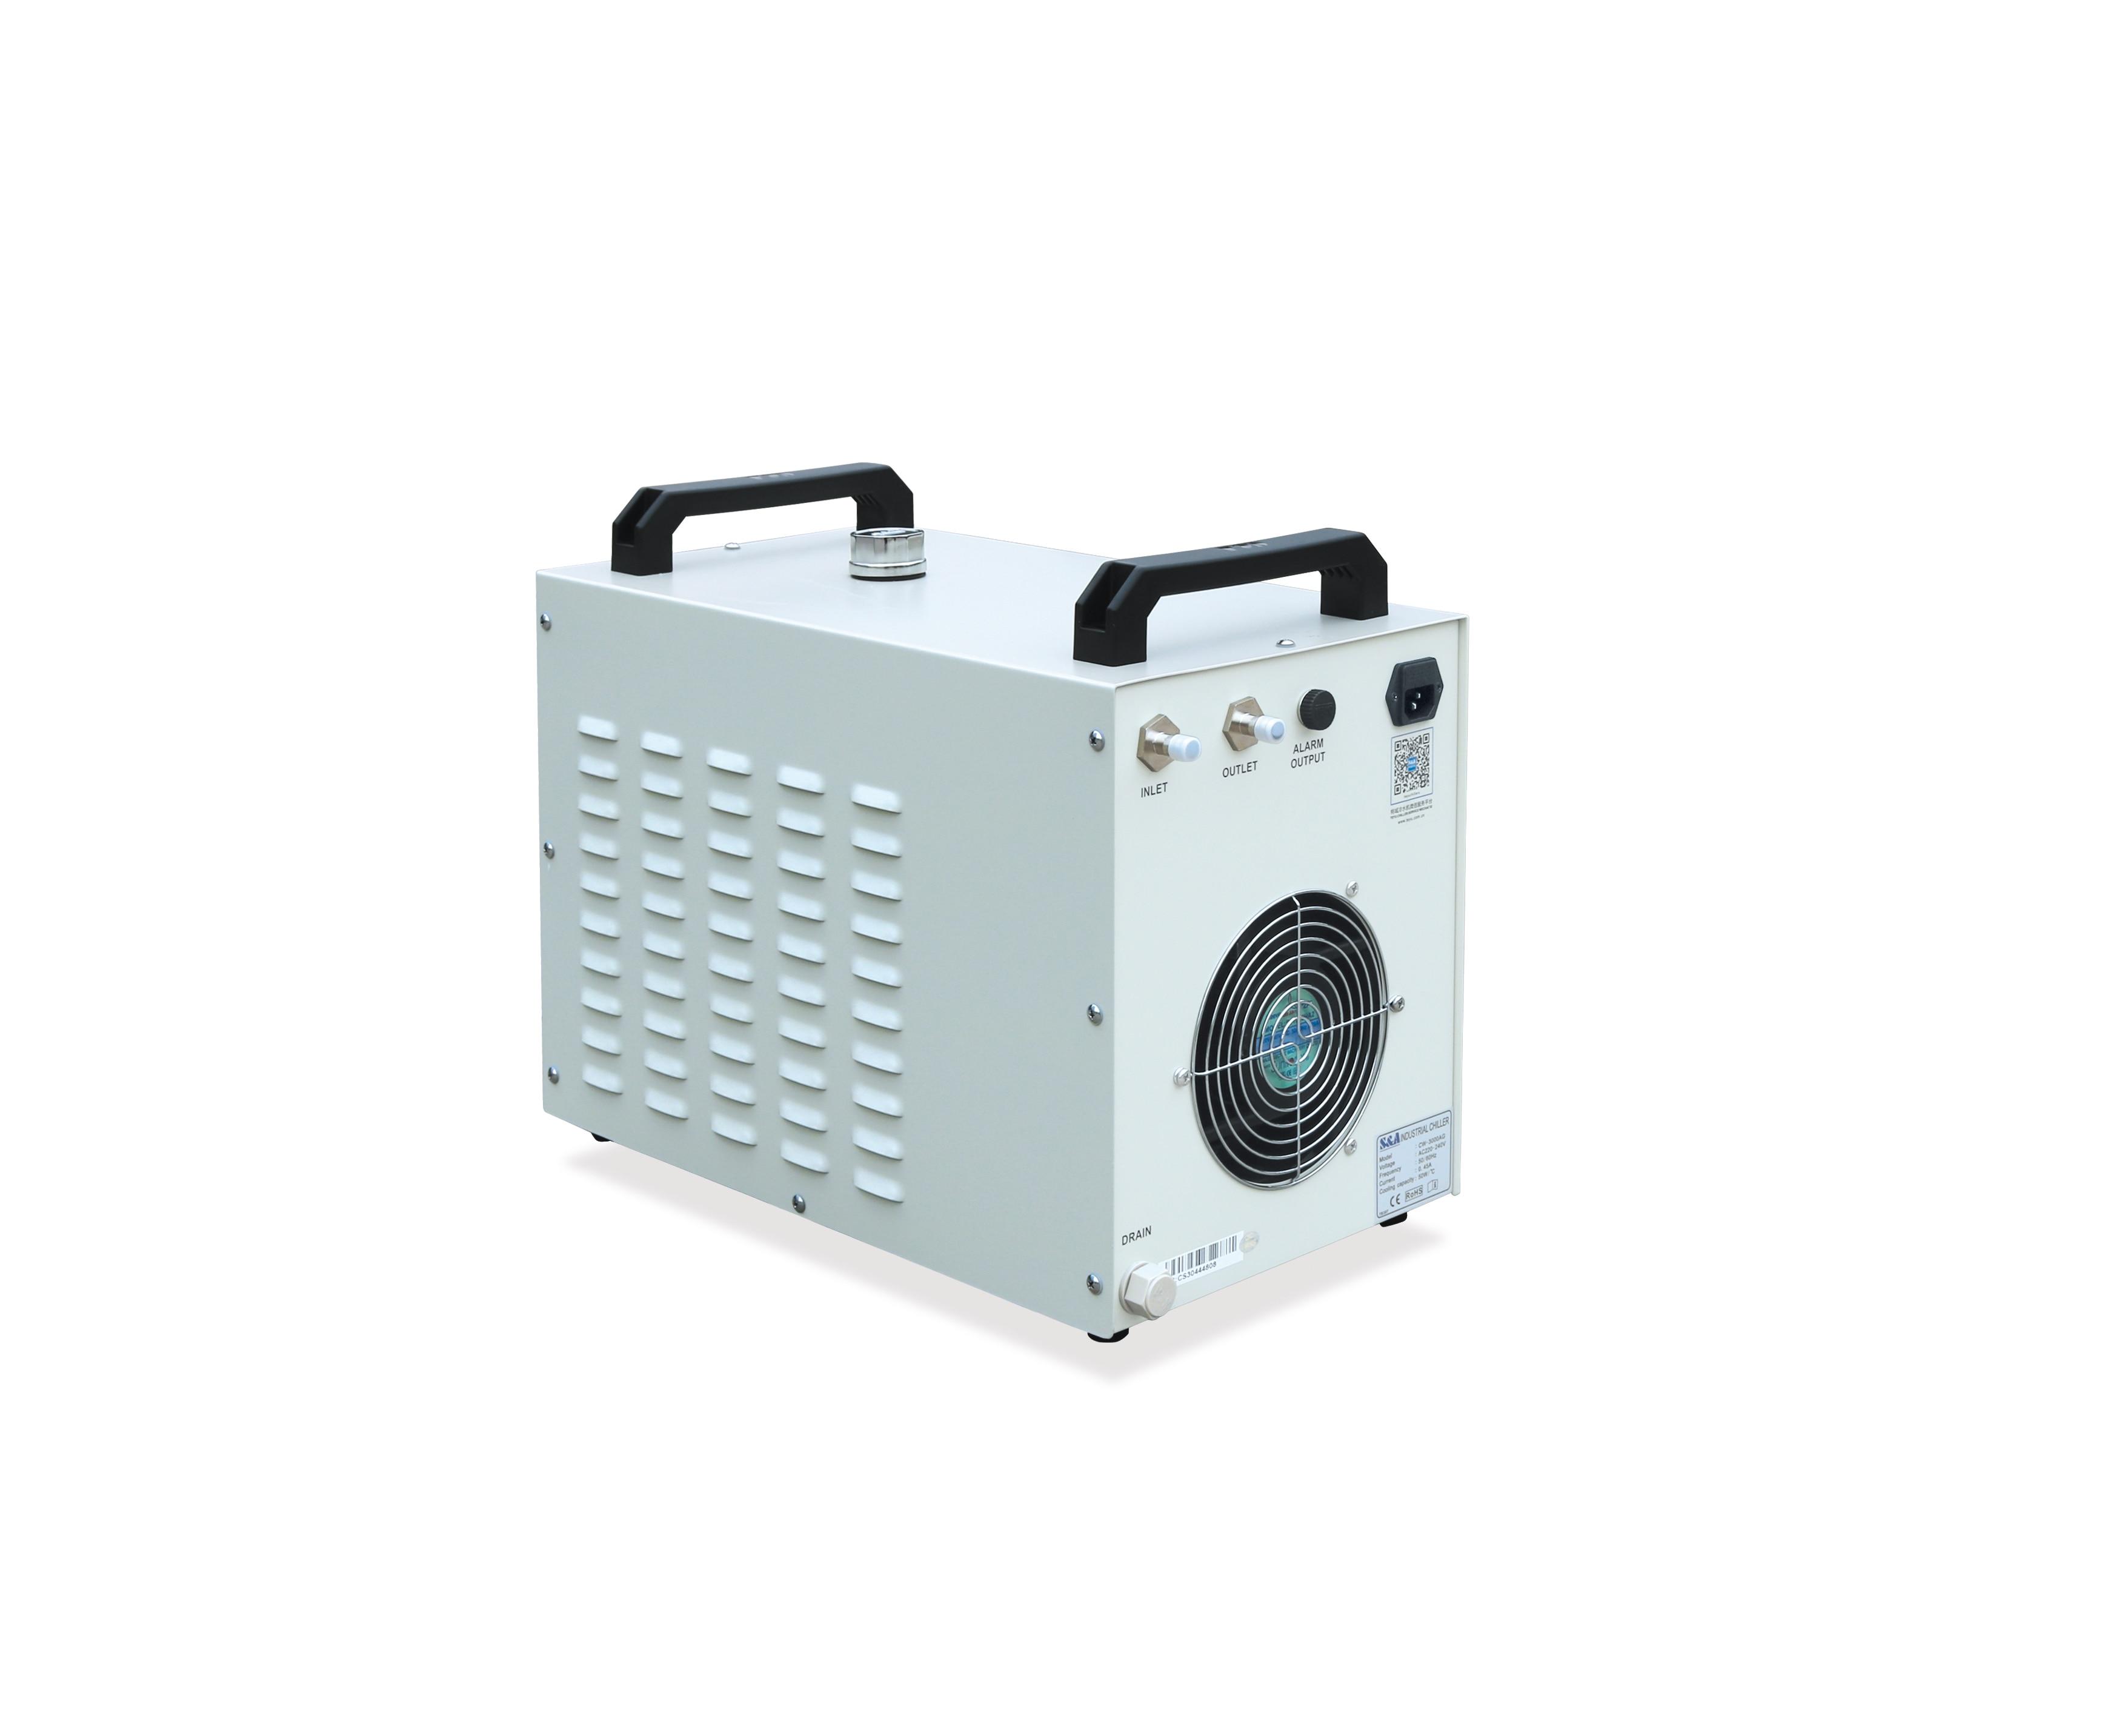 CW3000 لنظام تبريد آلة حفارة الليزر سطح المكتب لعام 4060